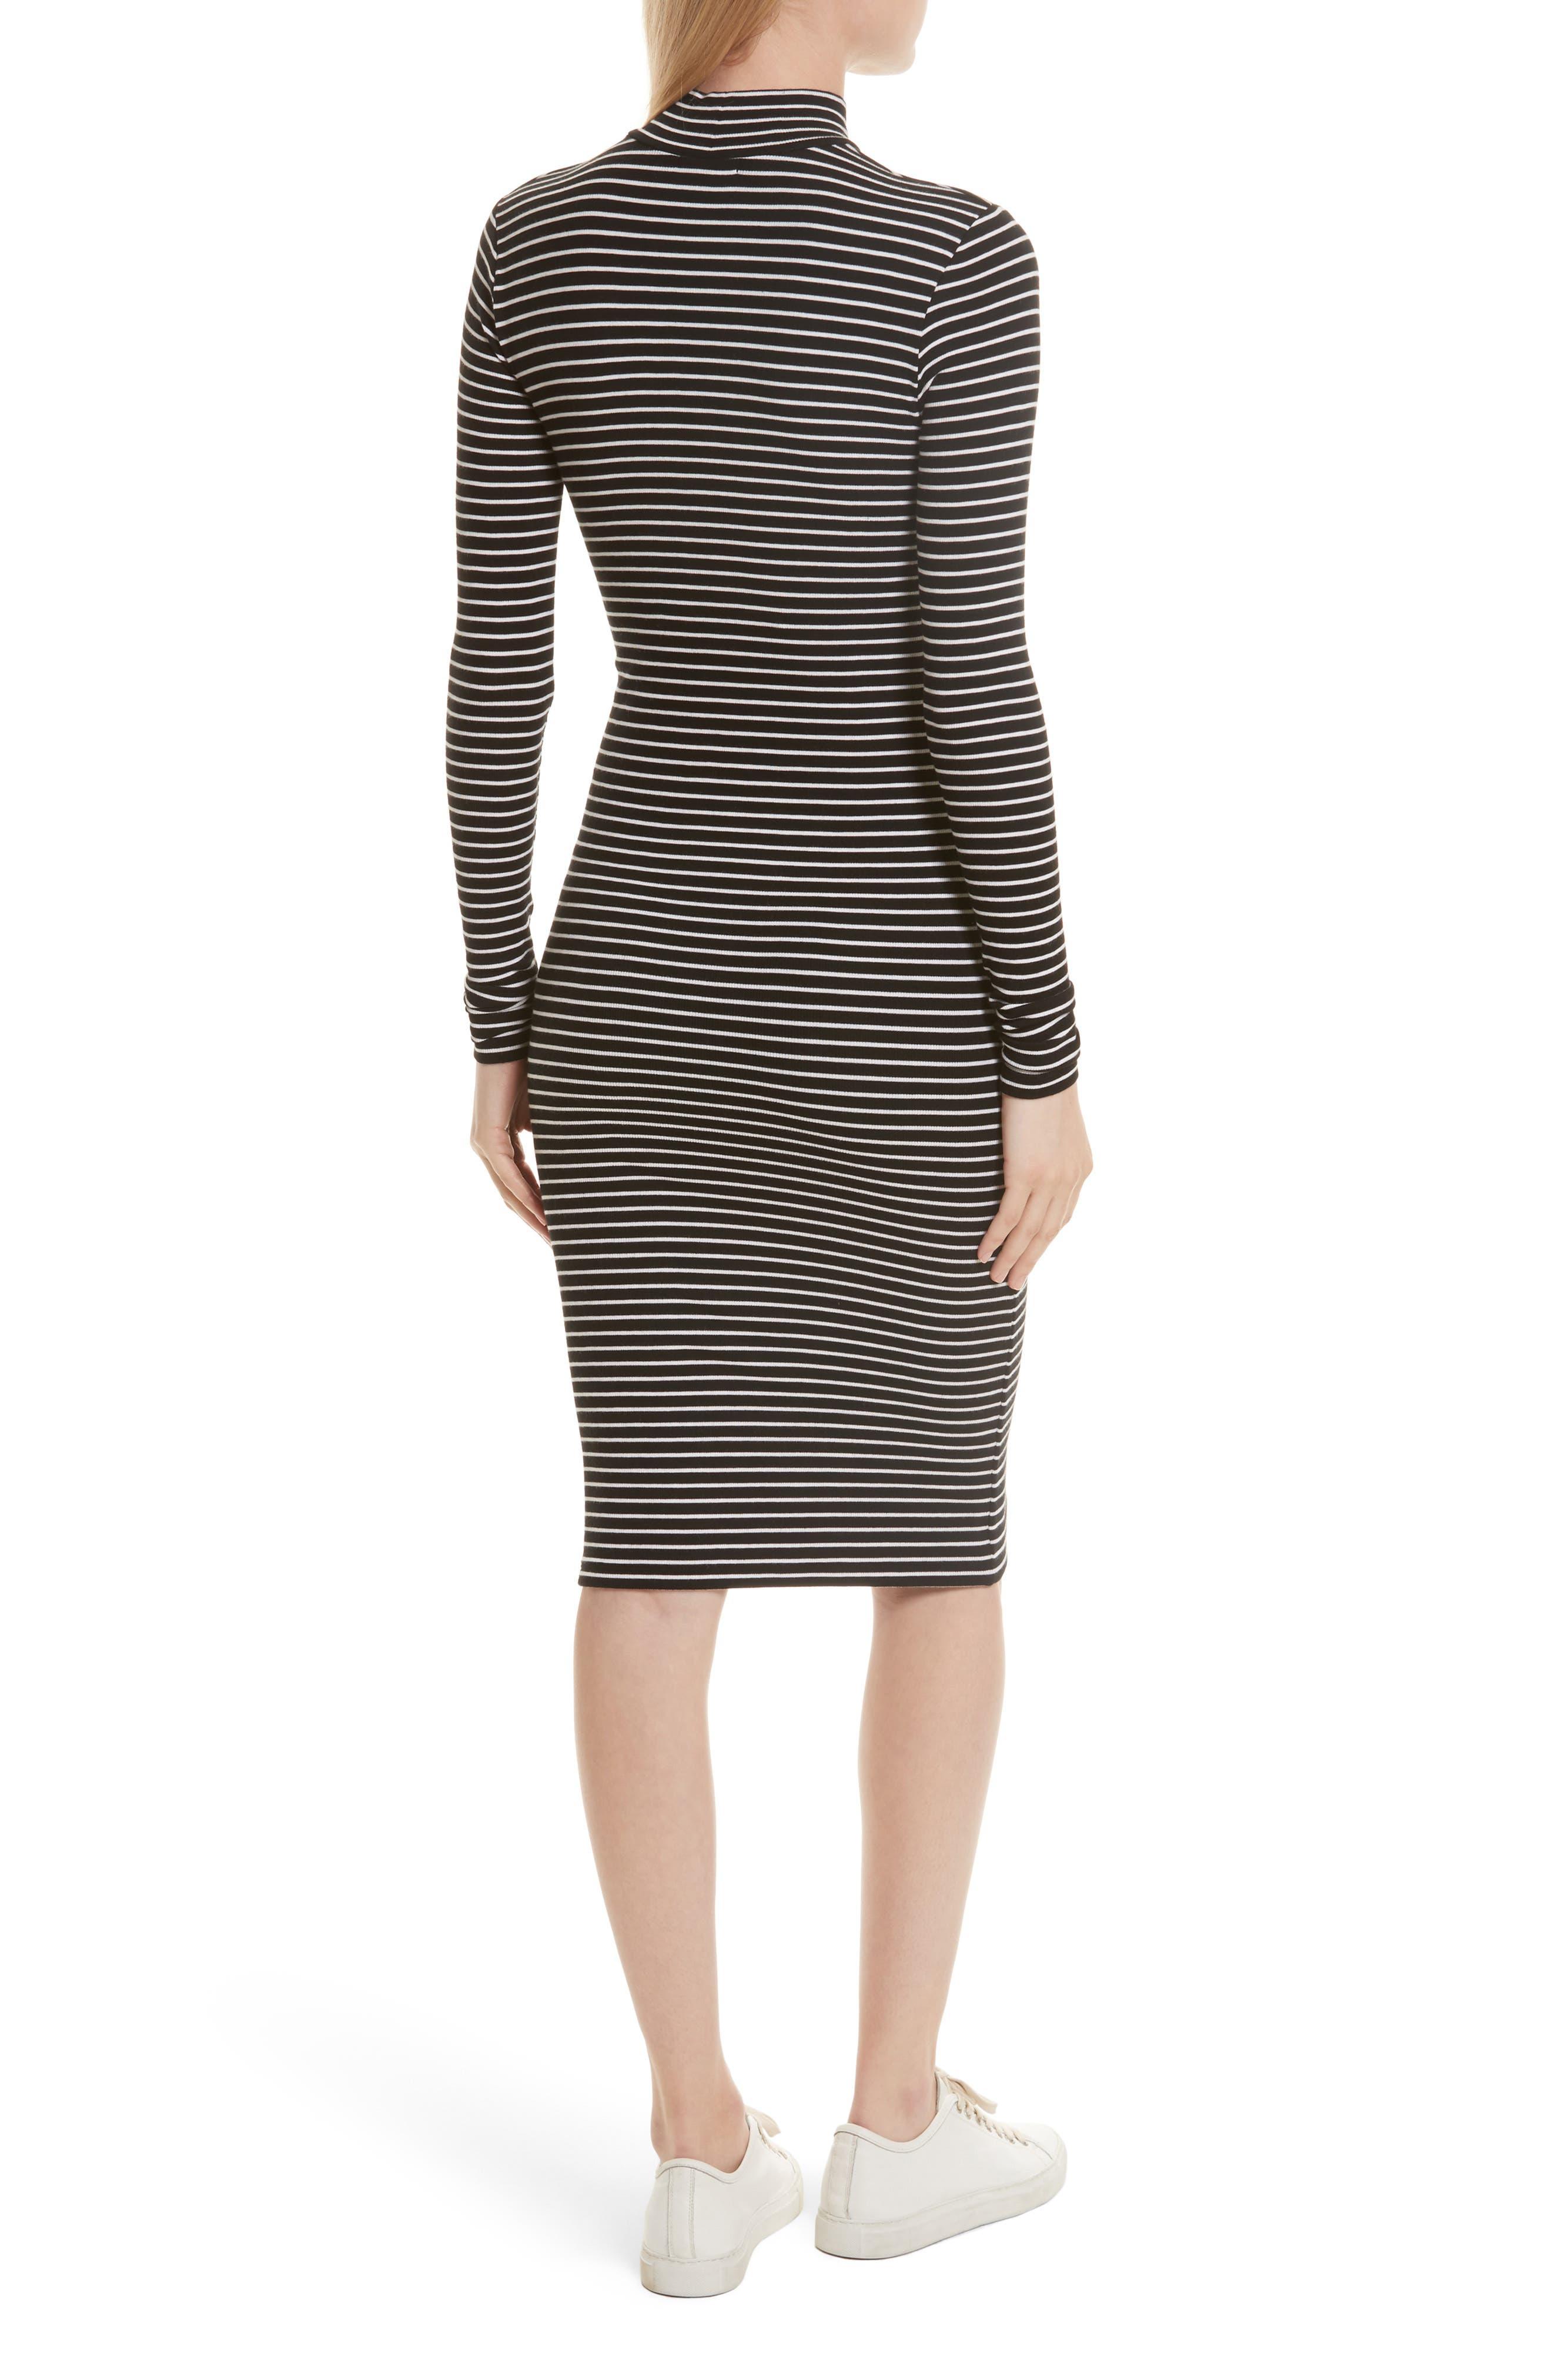 Alternate Image 3  - ATM Anthony Thomas Melillo Stripe Rib Jersey Dress (Nordstrom Exclusive)